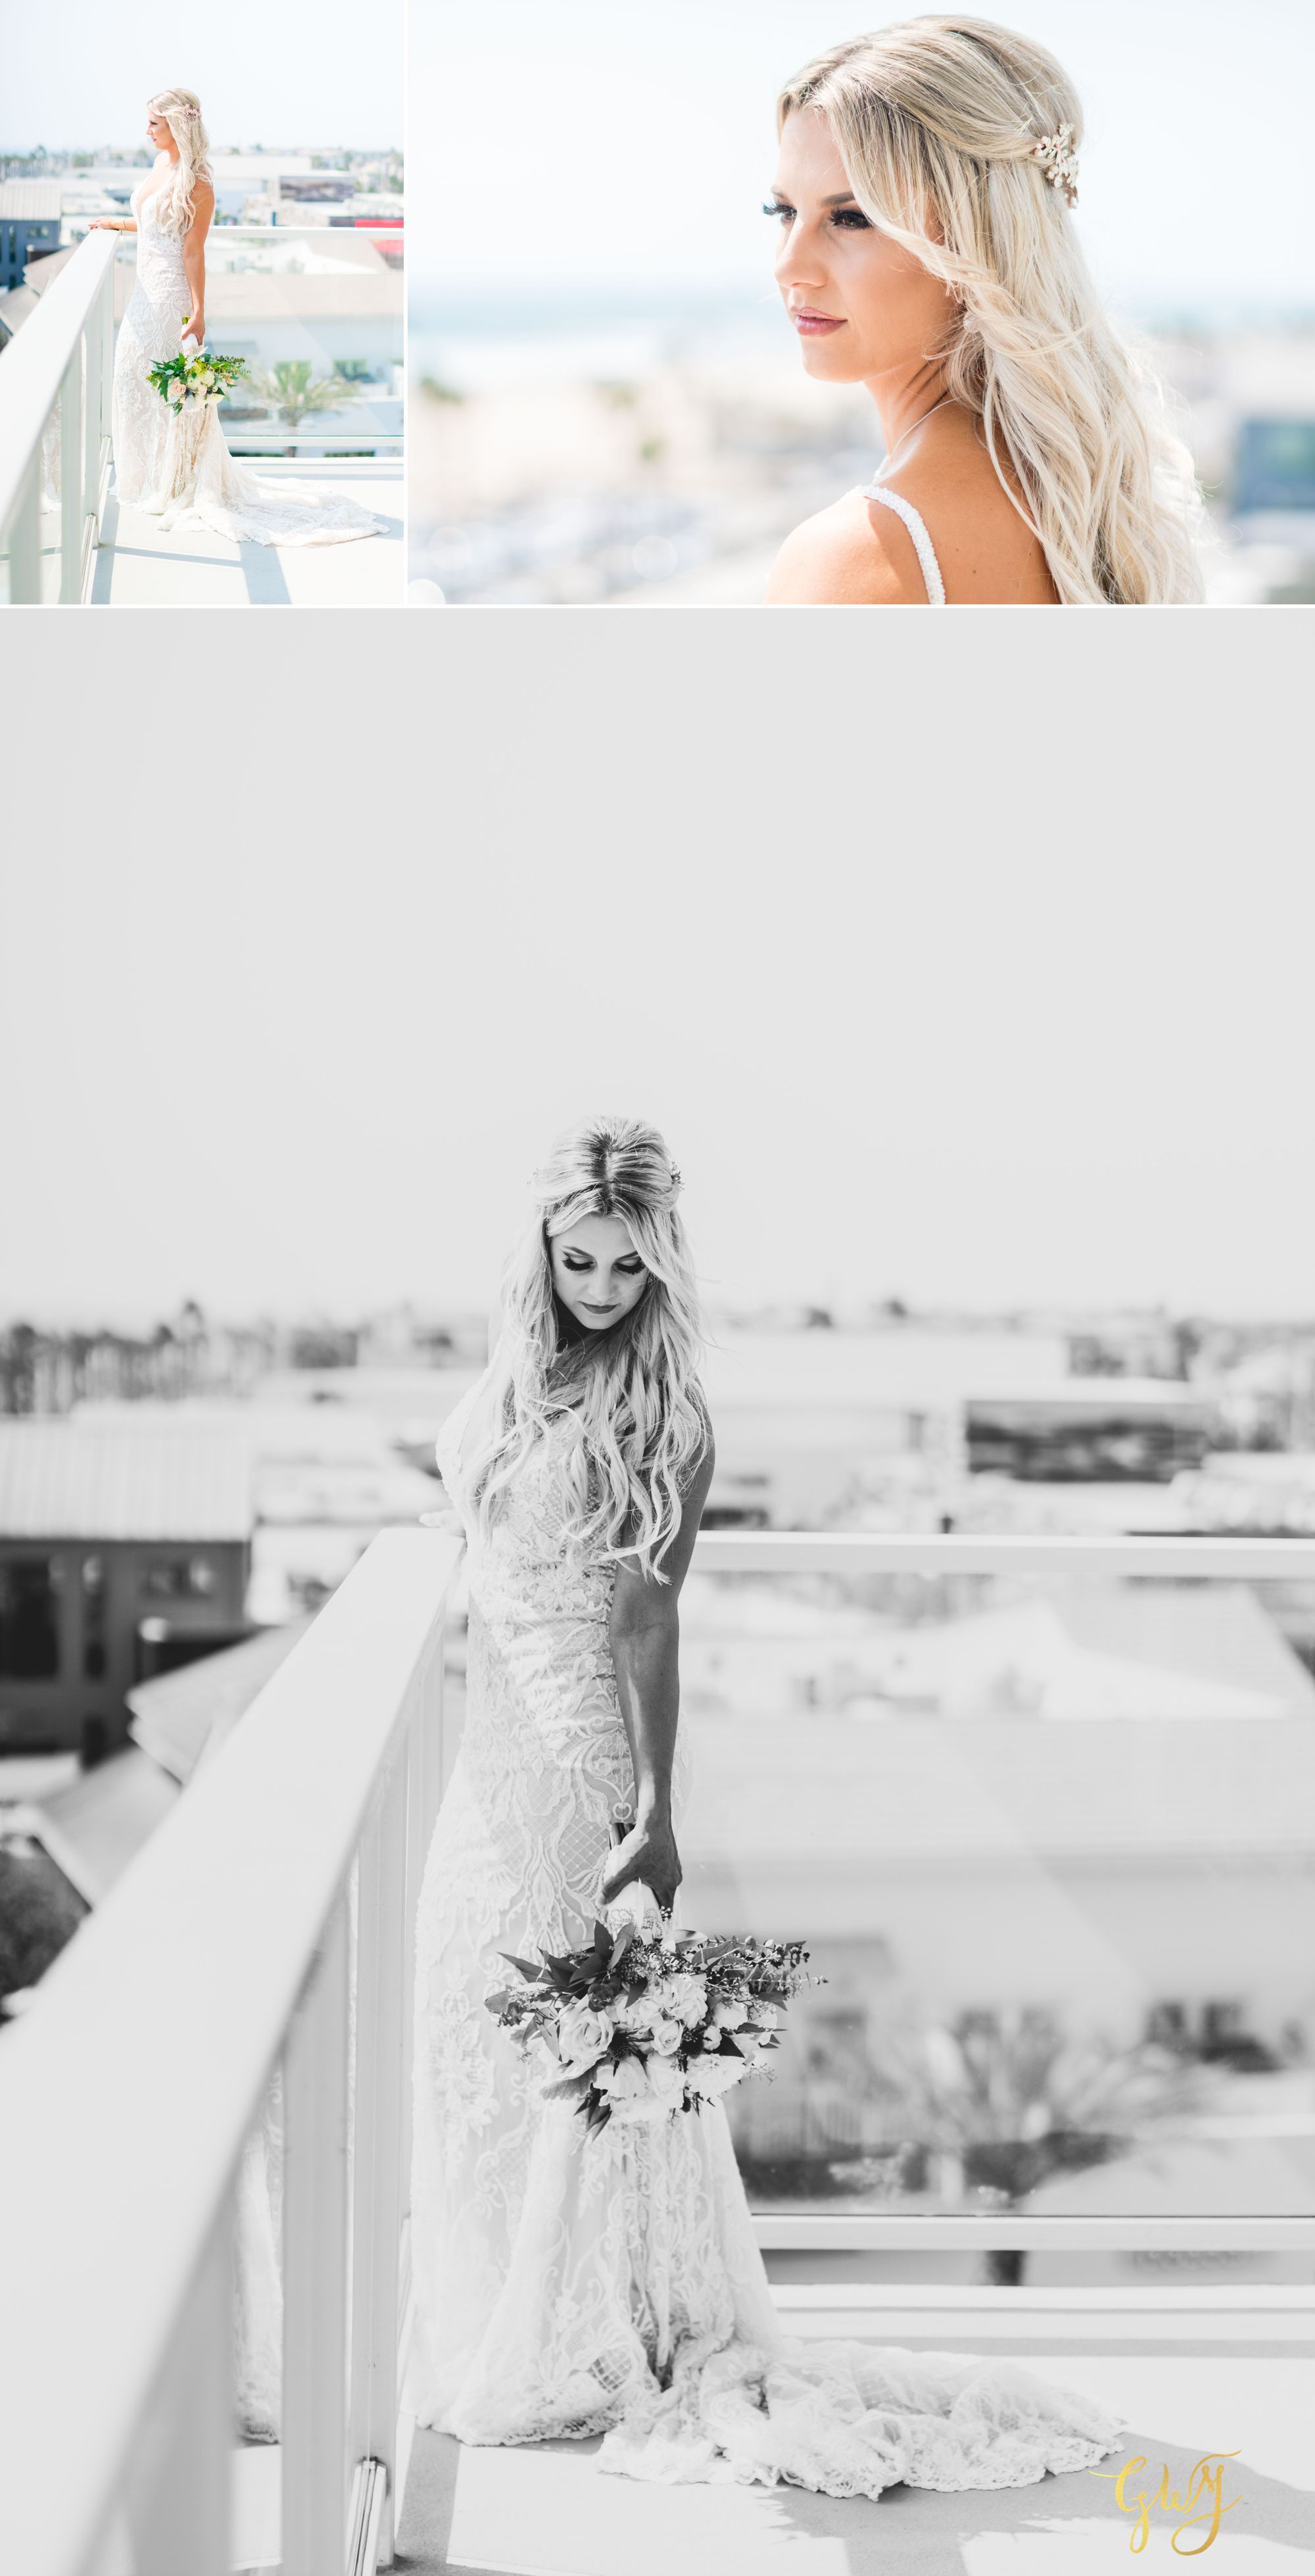 Christien + Crystal Pasea Hotel & Spa Huntington Beach Wedding by Glass Woods Media 20.jpg